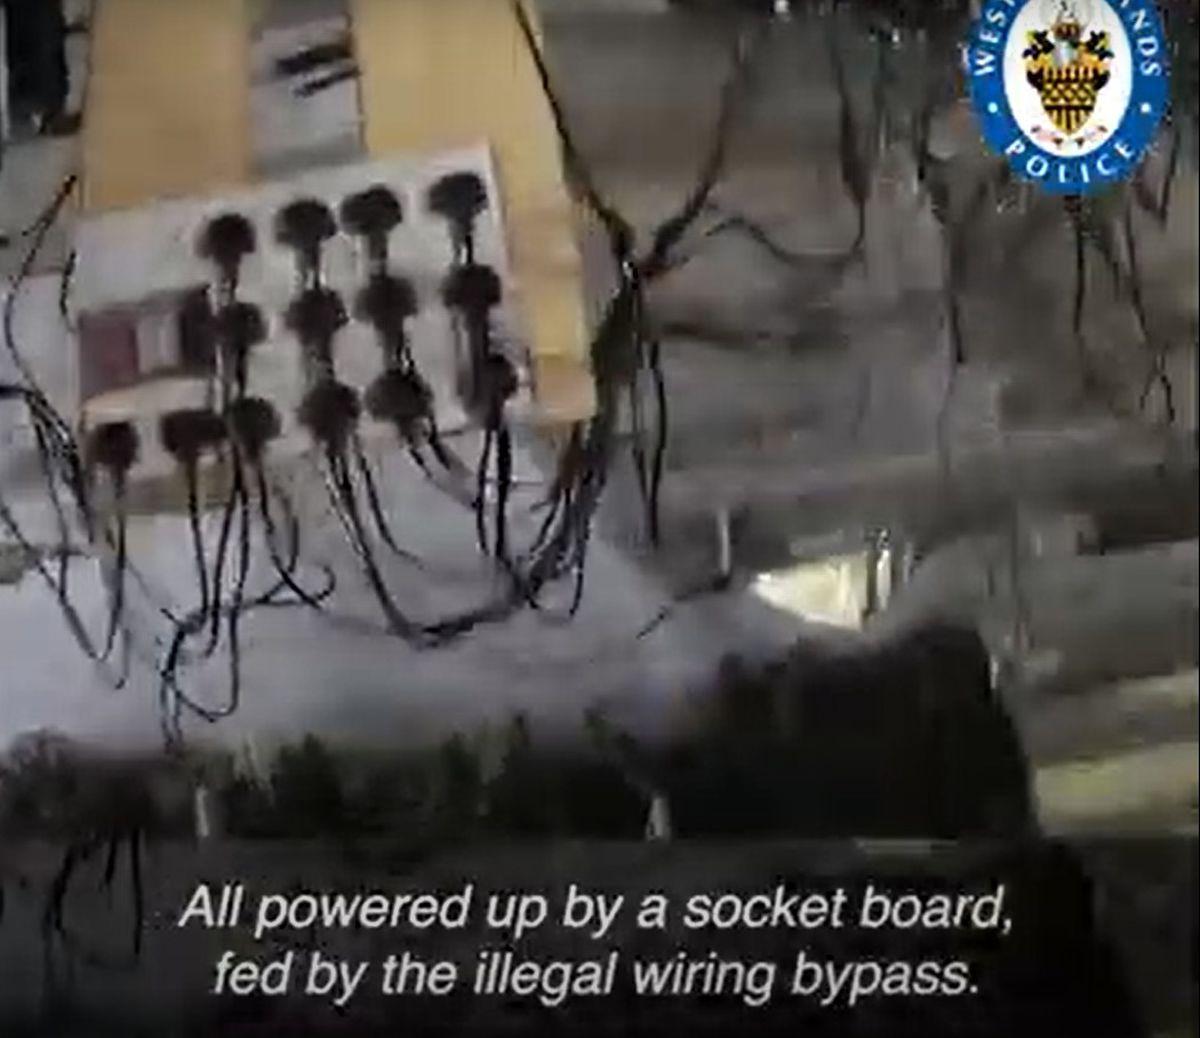 A socket board inside the cannabis factory